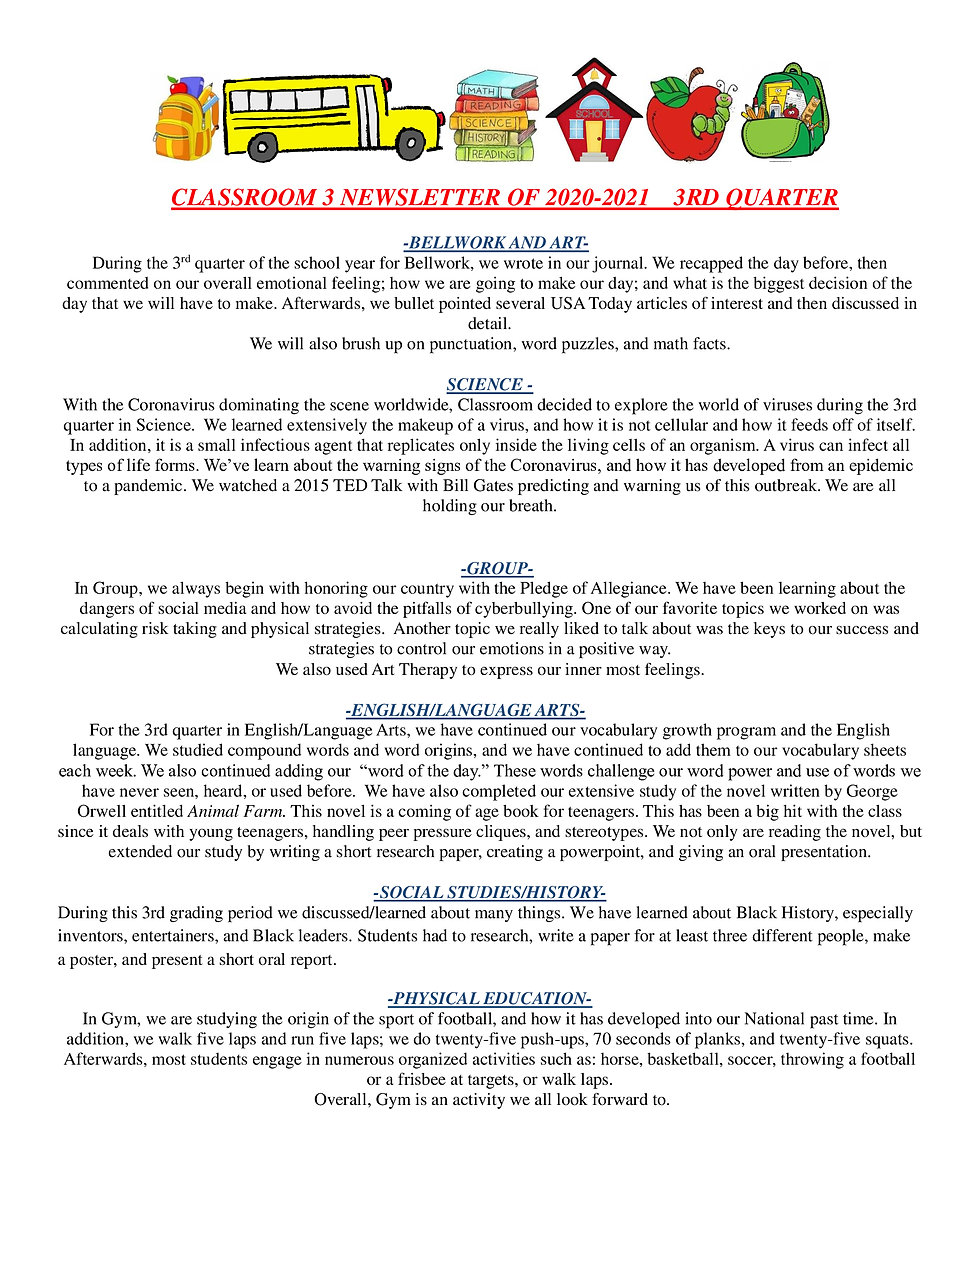 Classroom-3-Newsletter-3Q-Spring-2021.jp